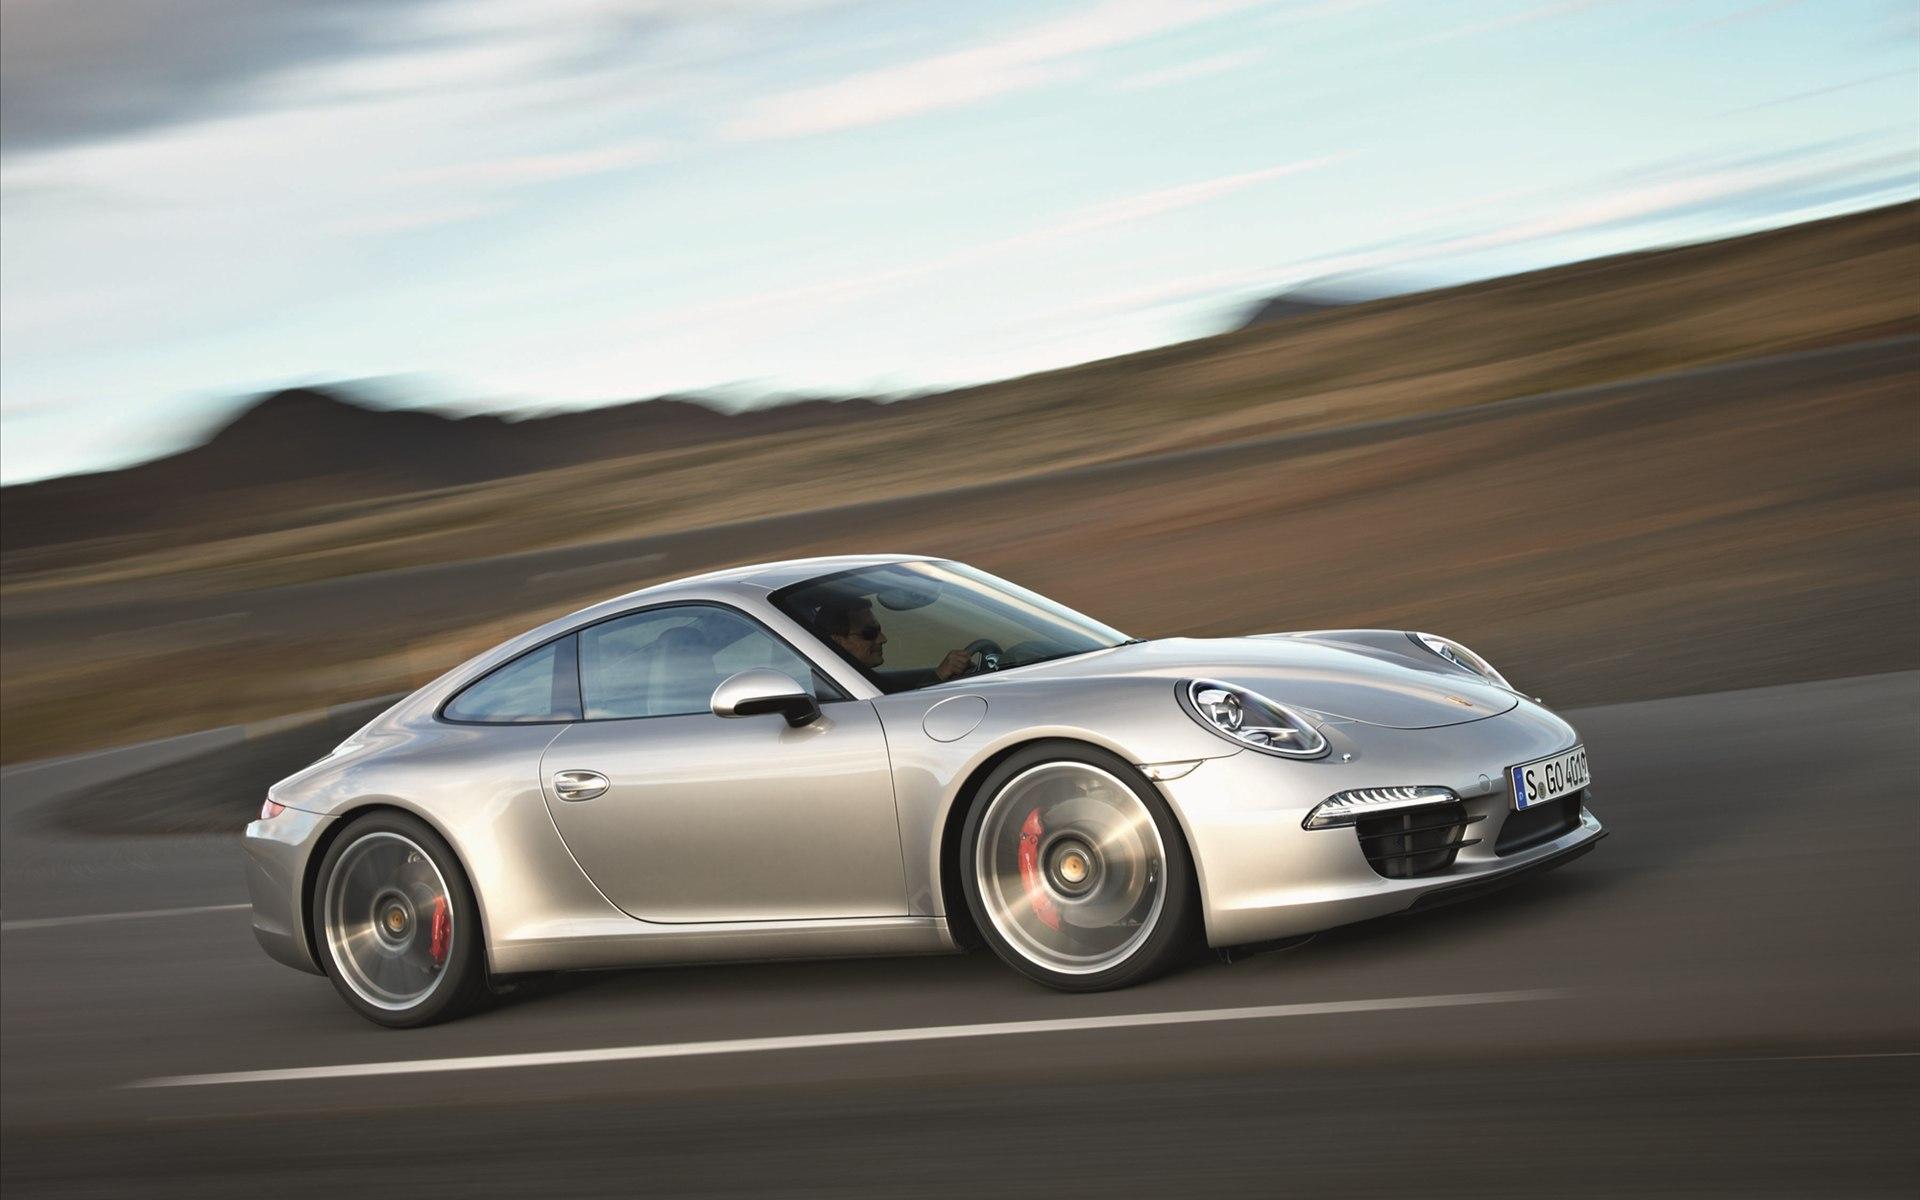 Porsche 911 Carrera S 2012 wallpaper   618471 1920x1200